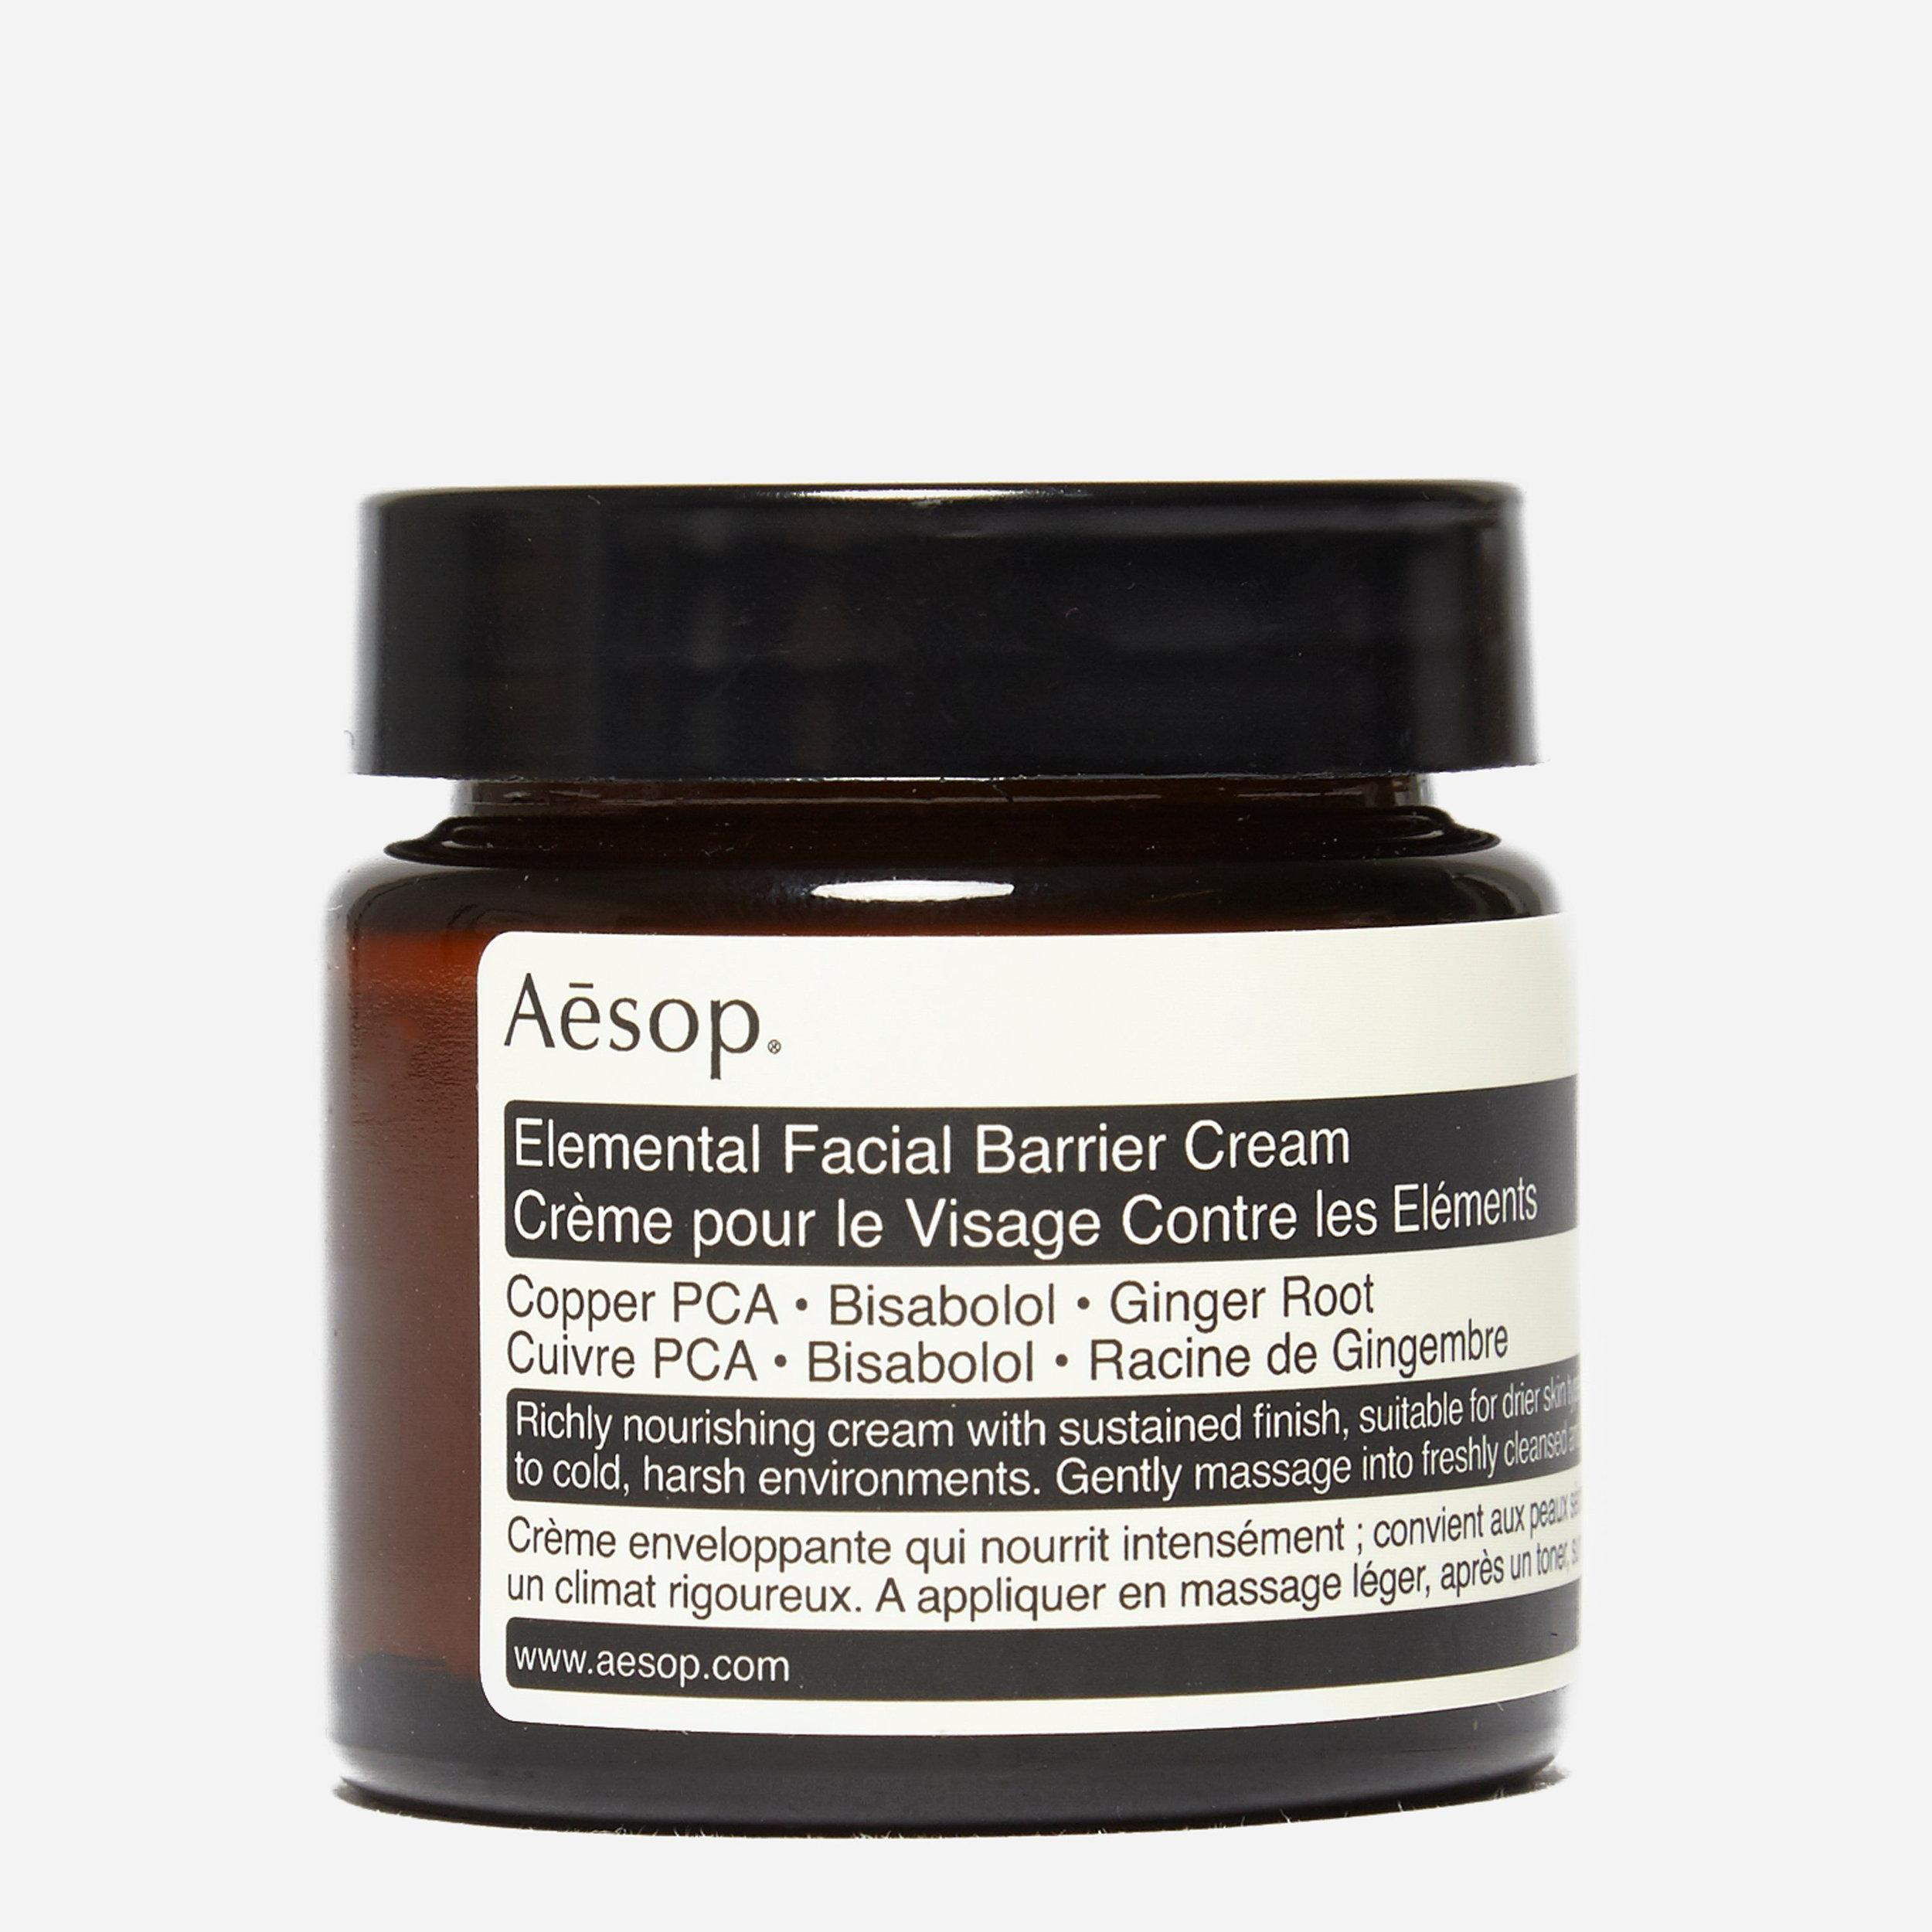 Elemental Facial Barrier Cream AESOP, $79